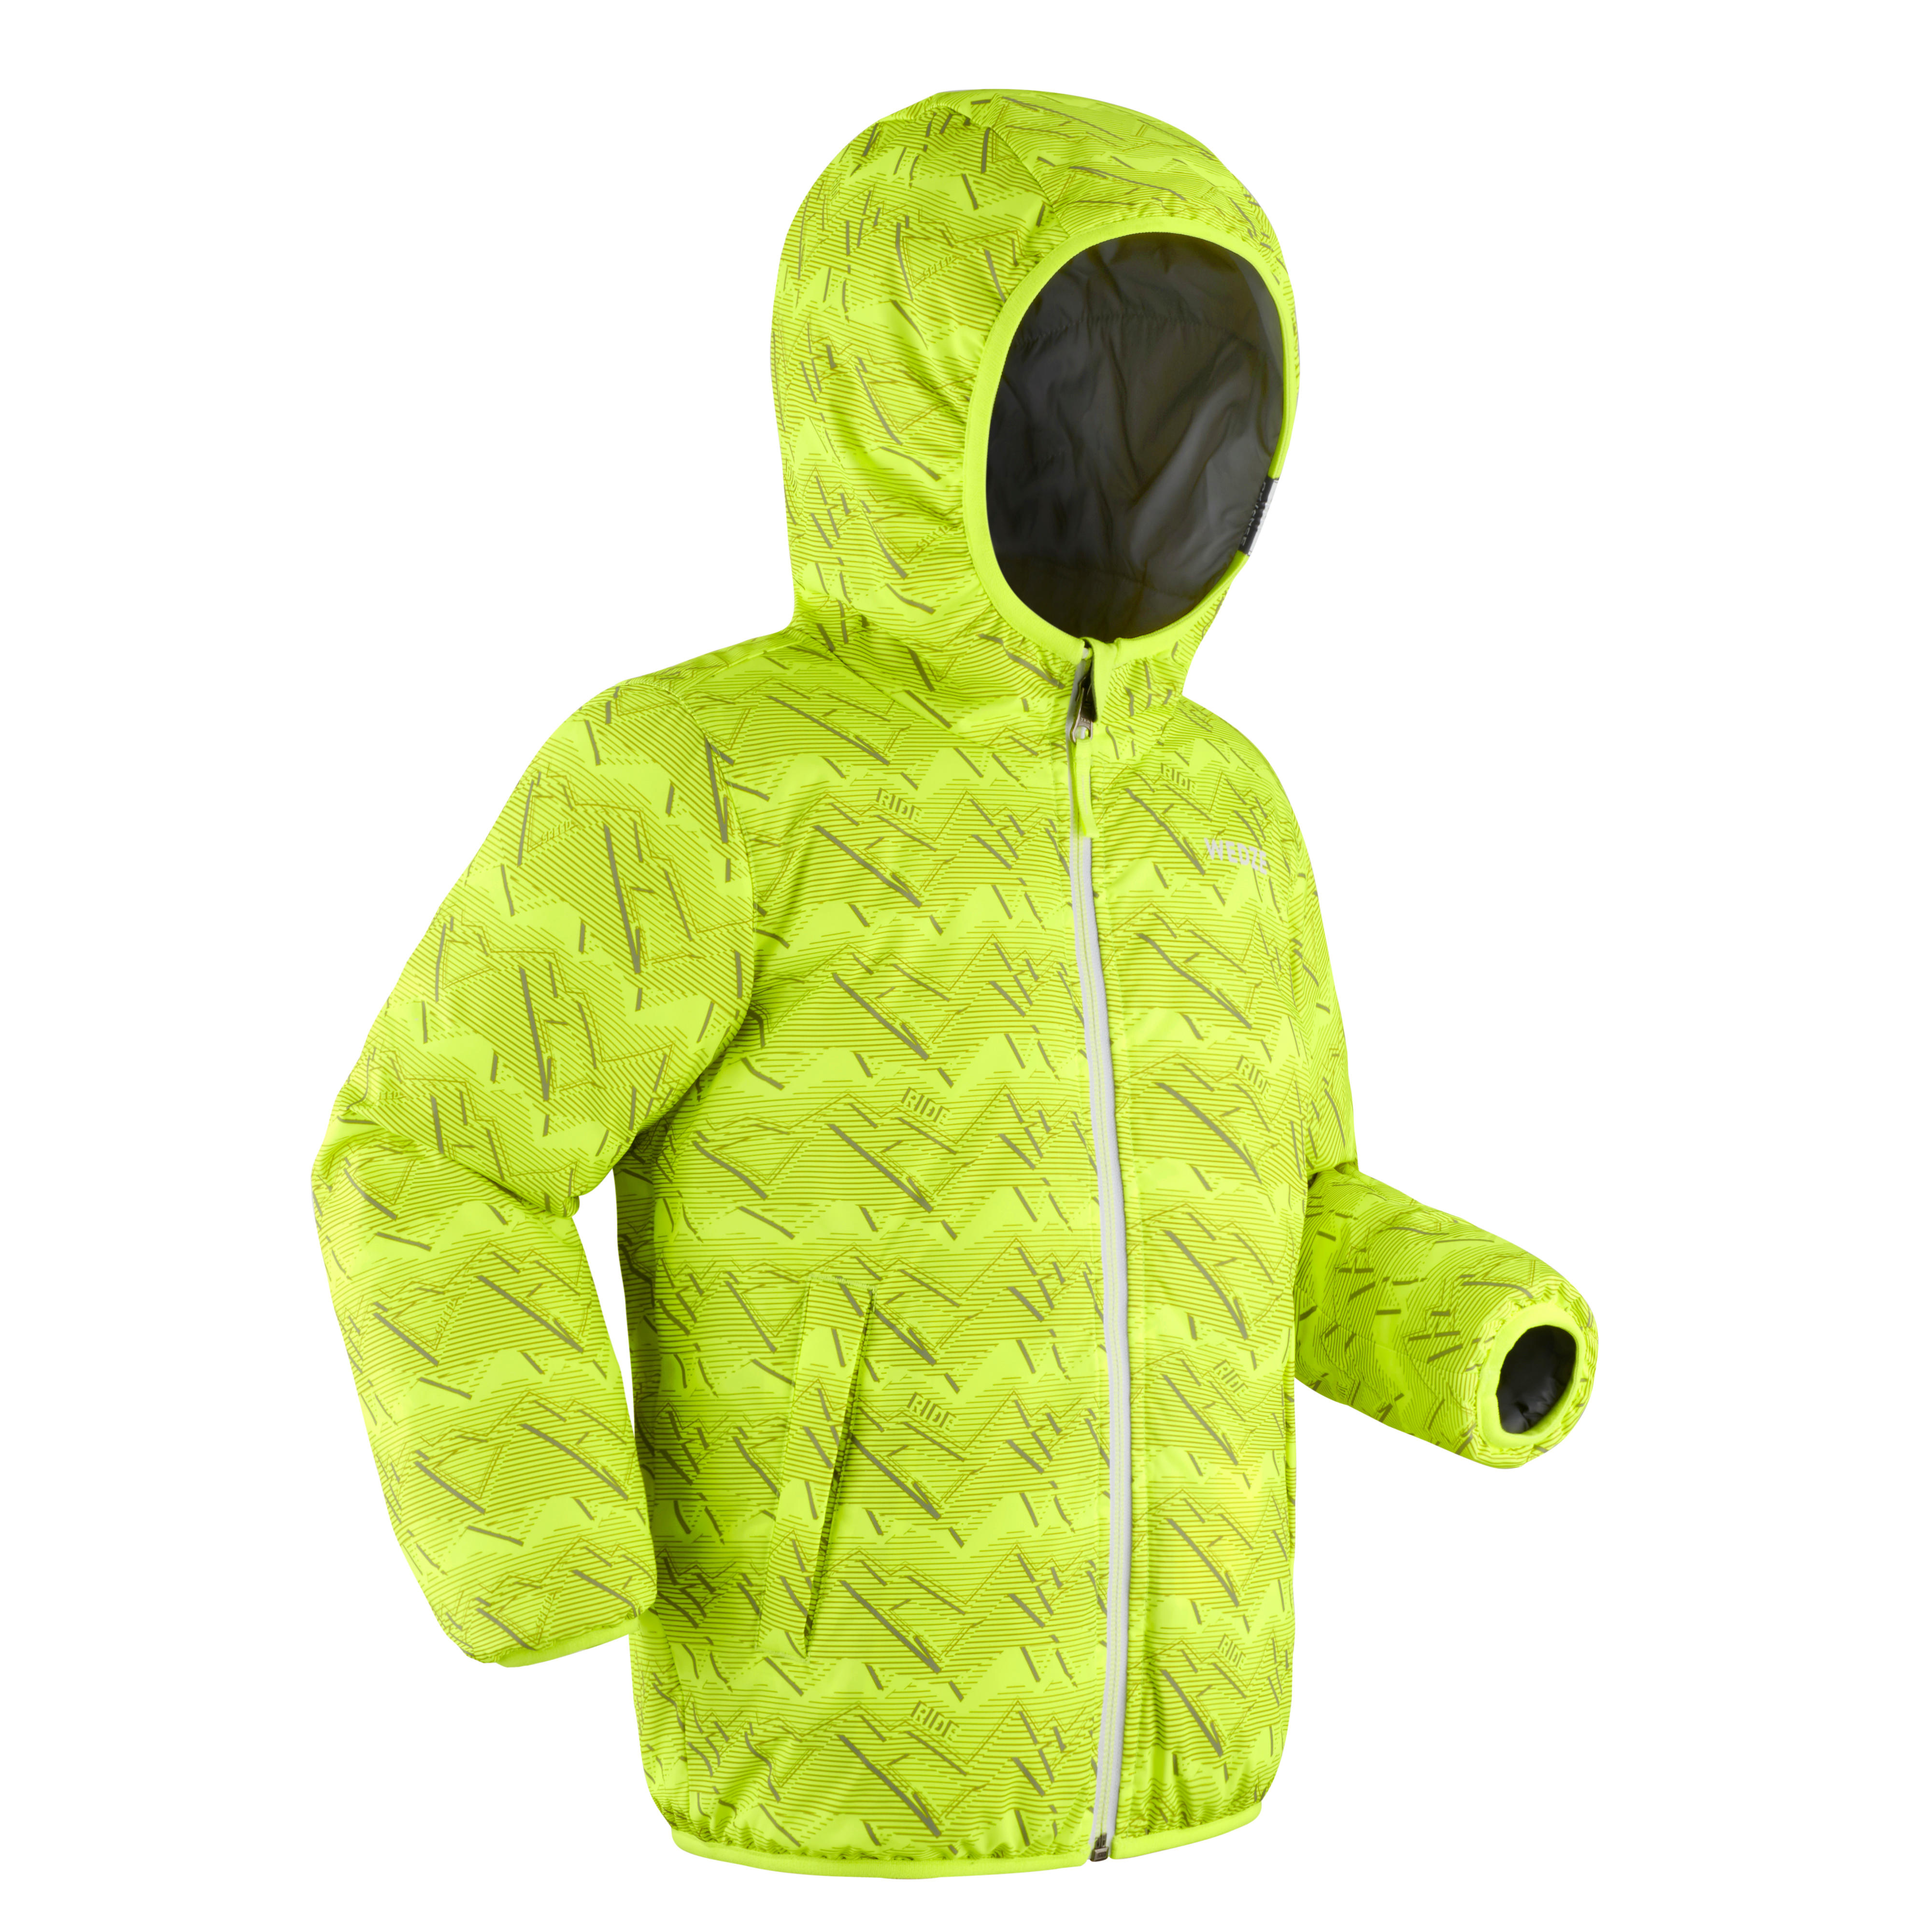 Jachetă schi RVS 100 Copii imagine